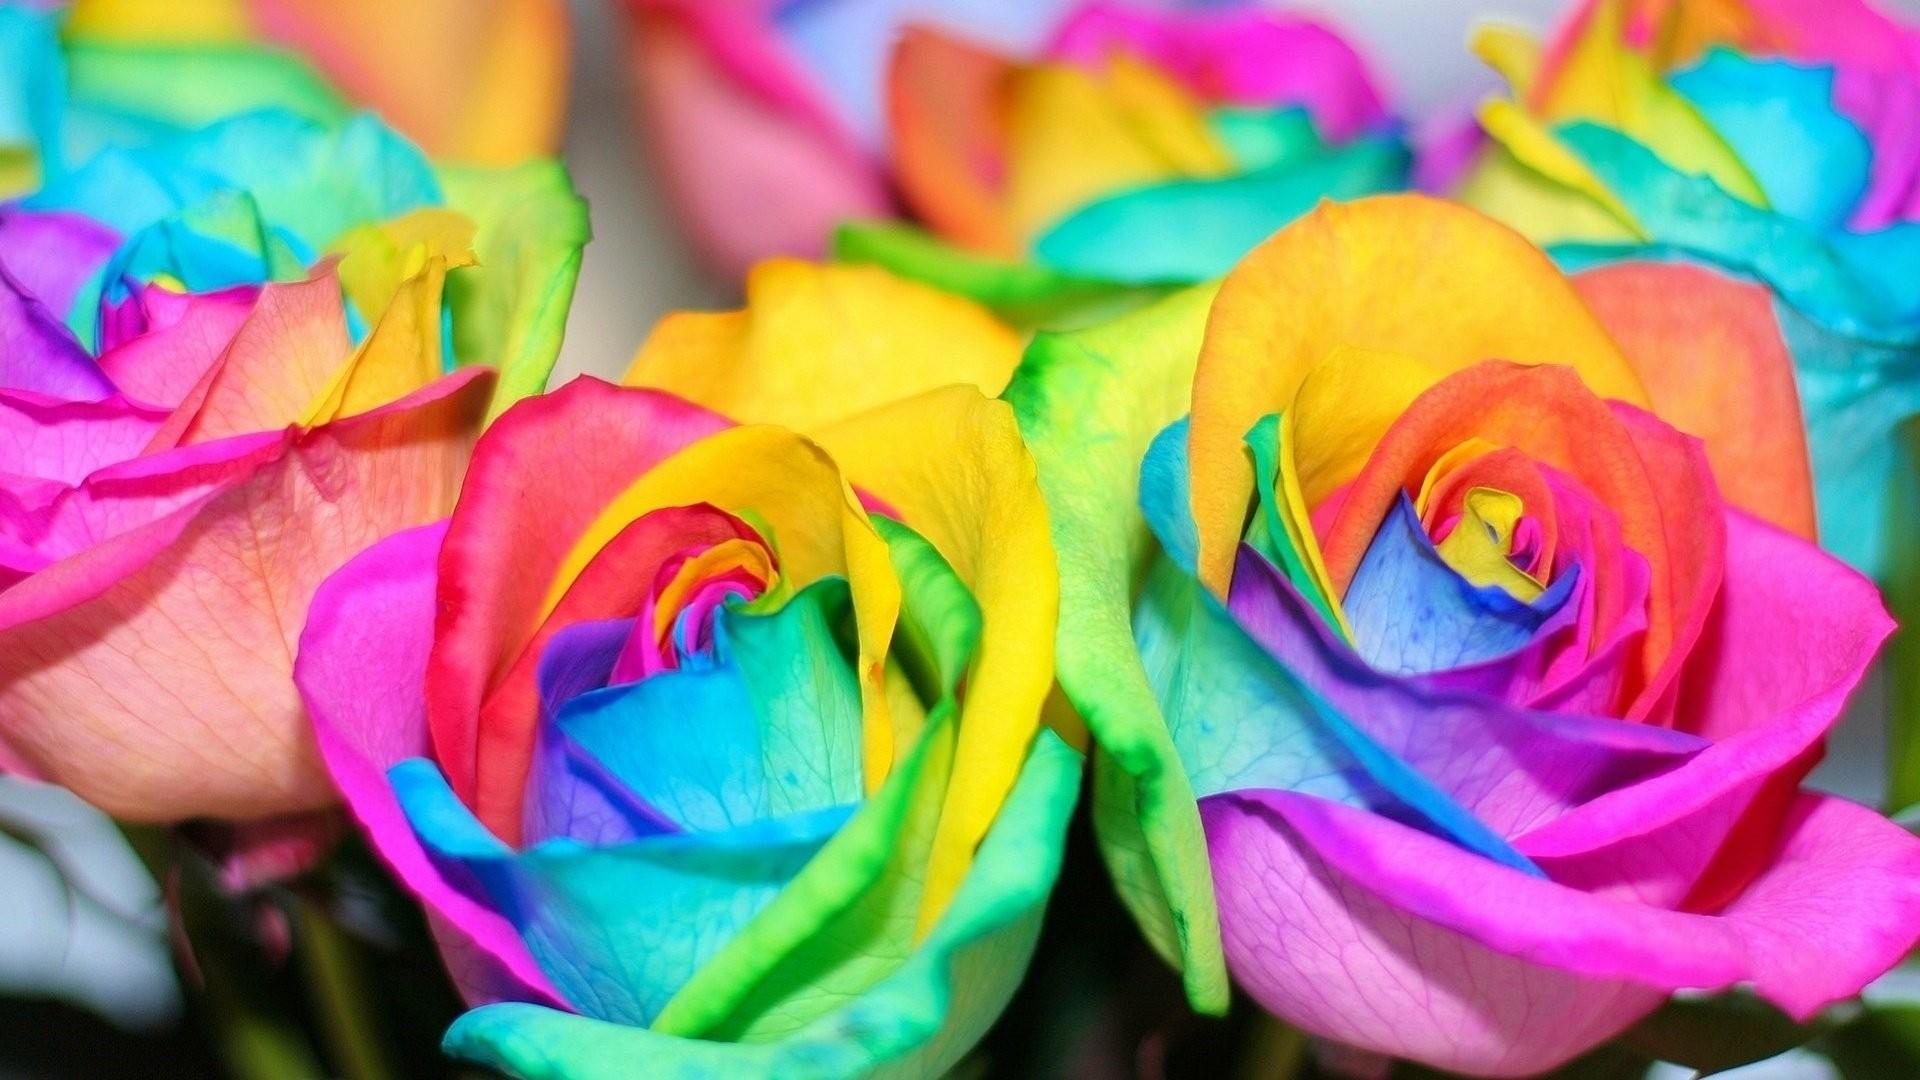 Rainbow Rose HD Download